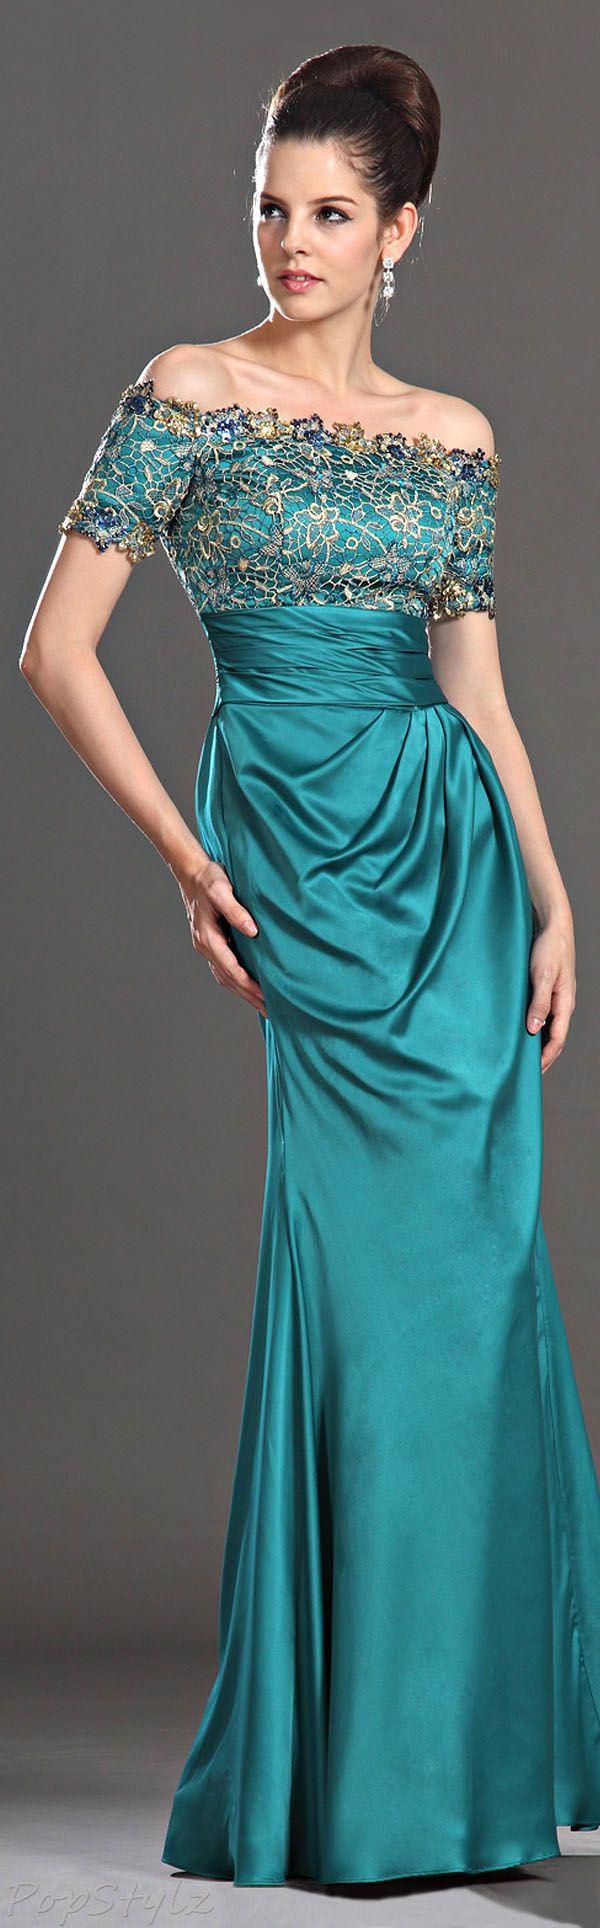 261 best posh frocks images on Pinterest | Curve maxi dresses ...